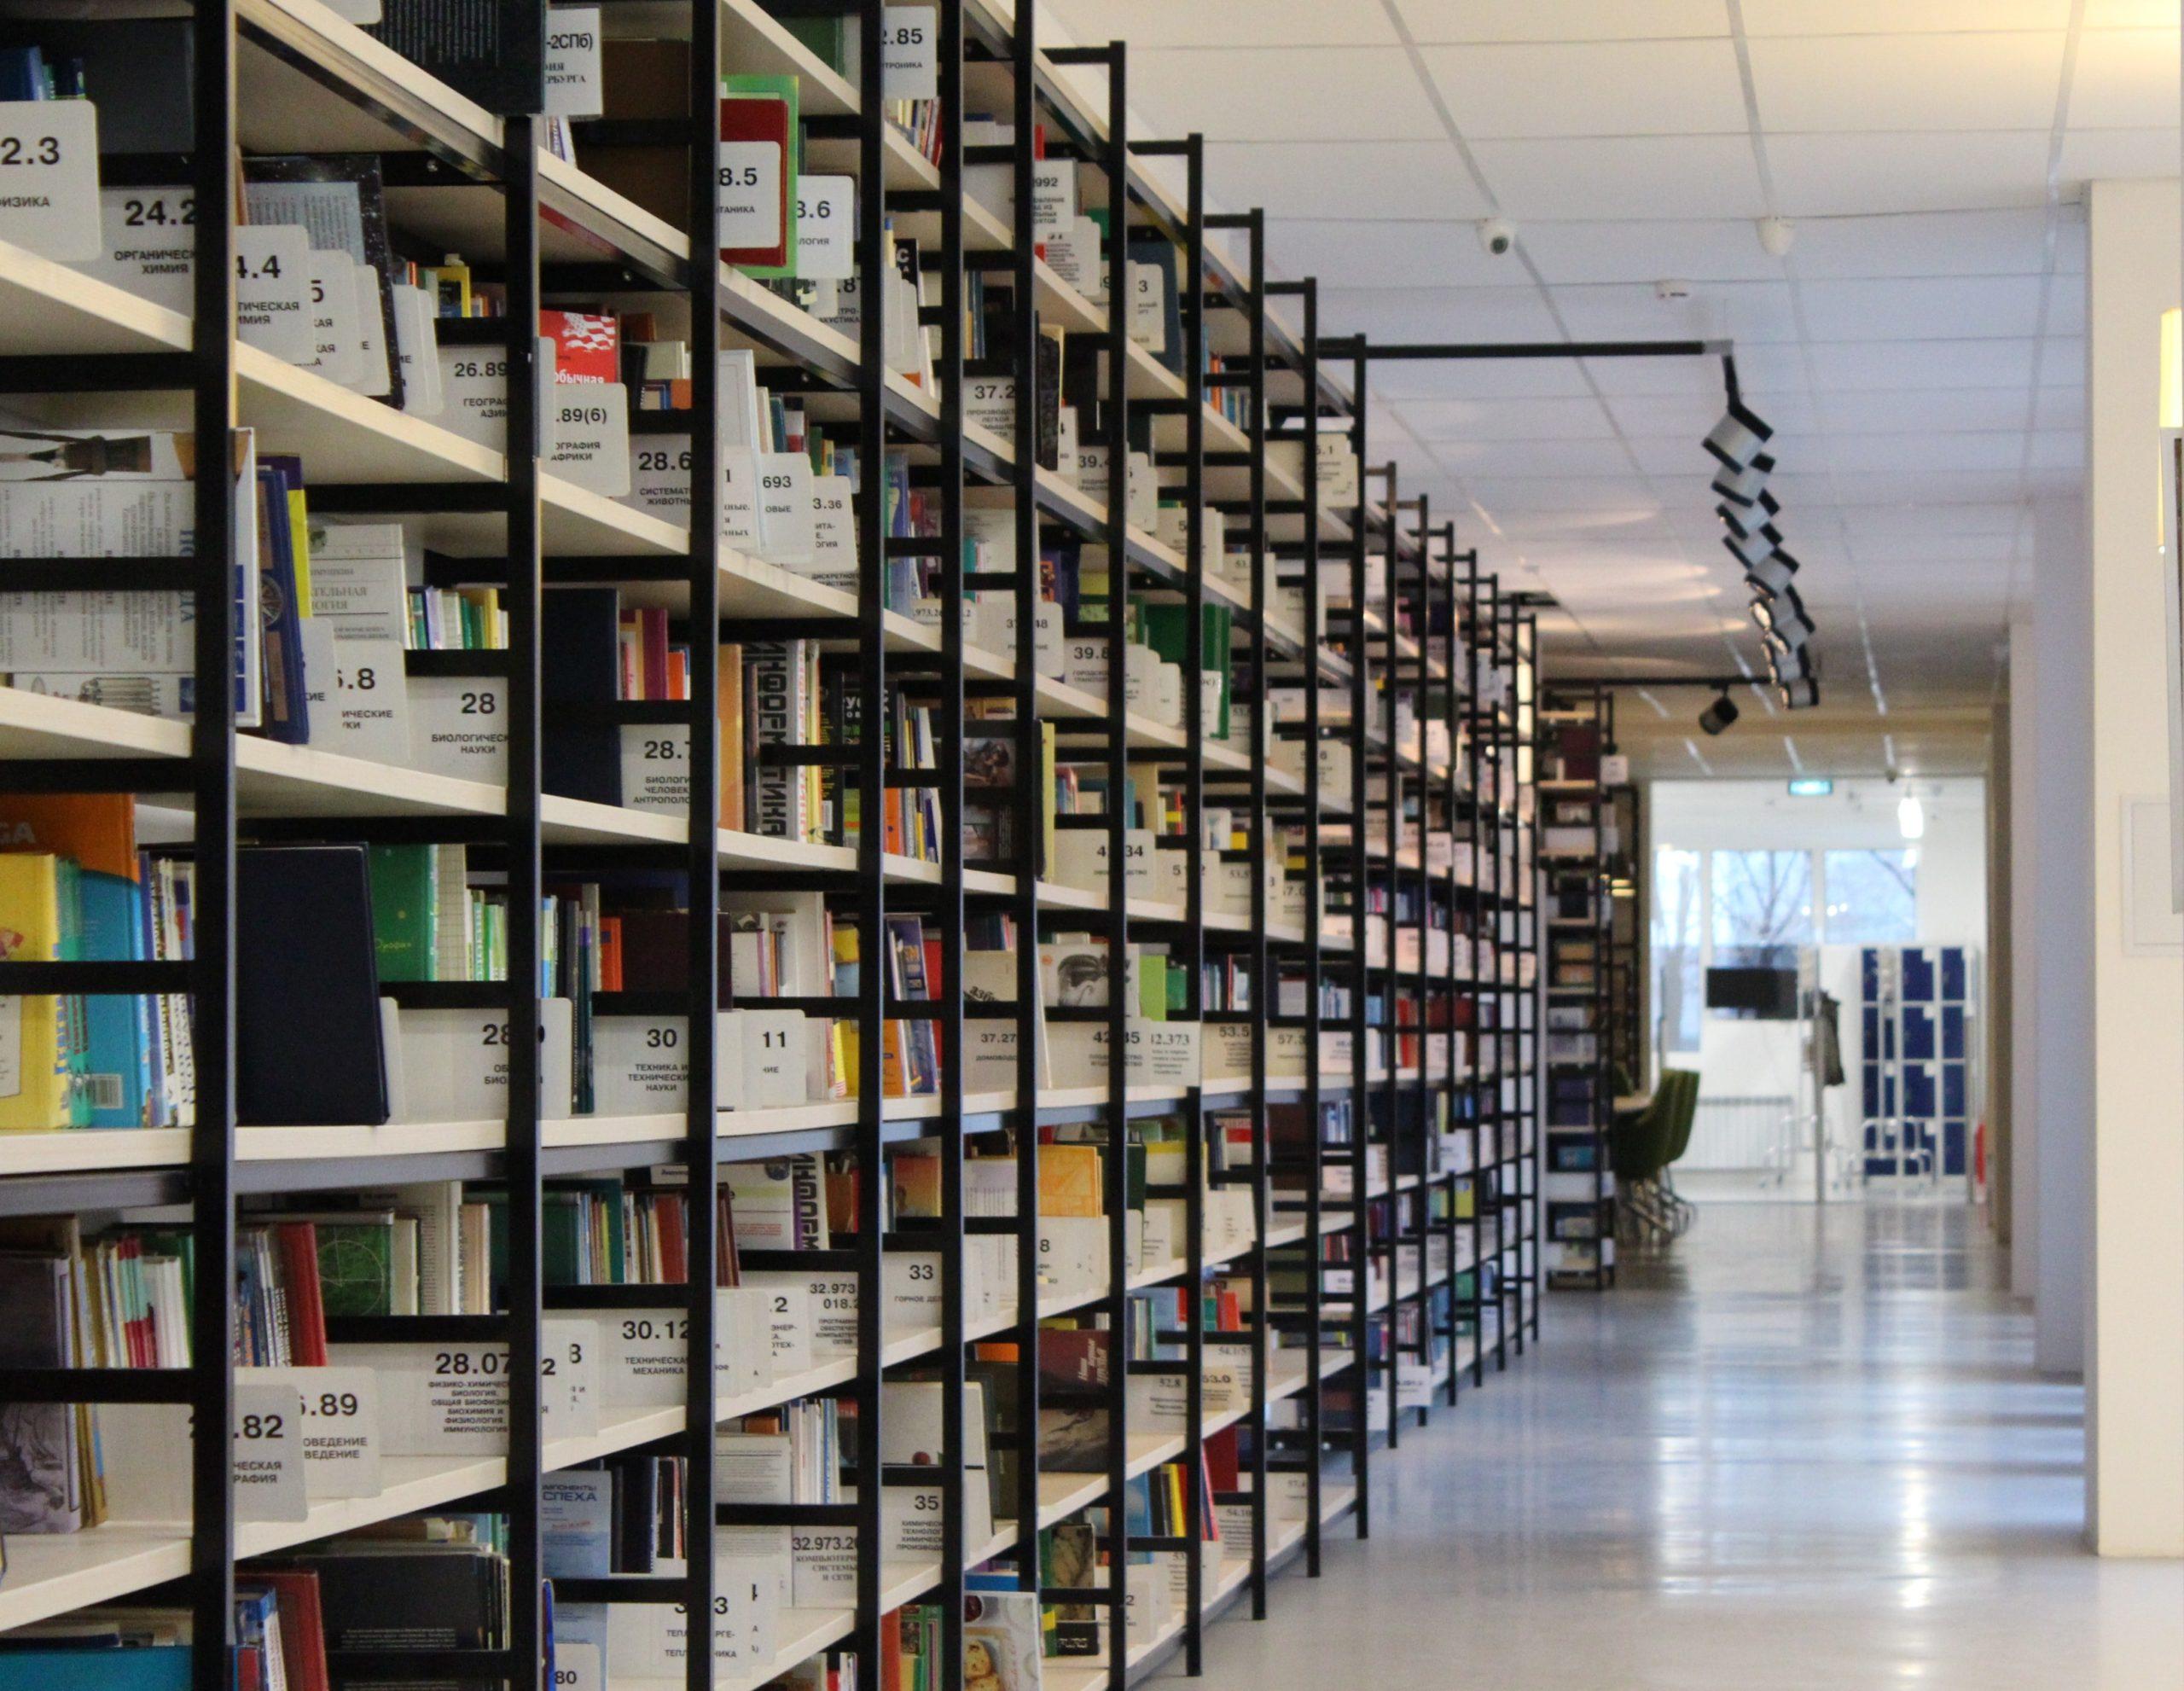 stack-of-books-in-shelf